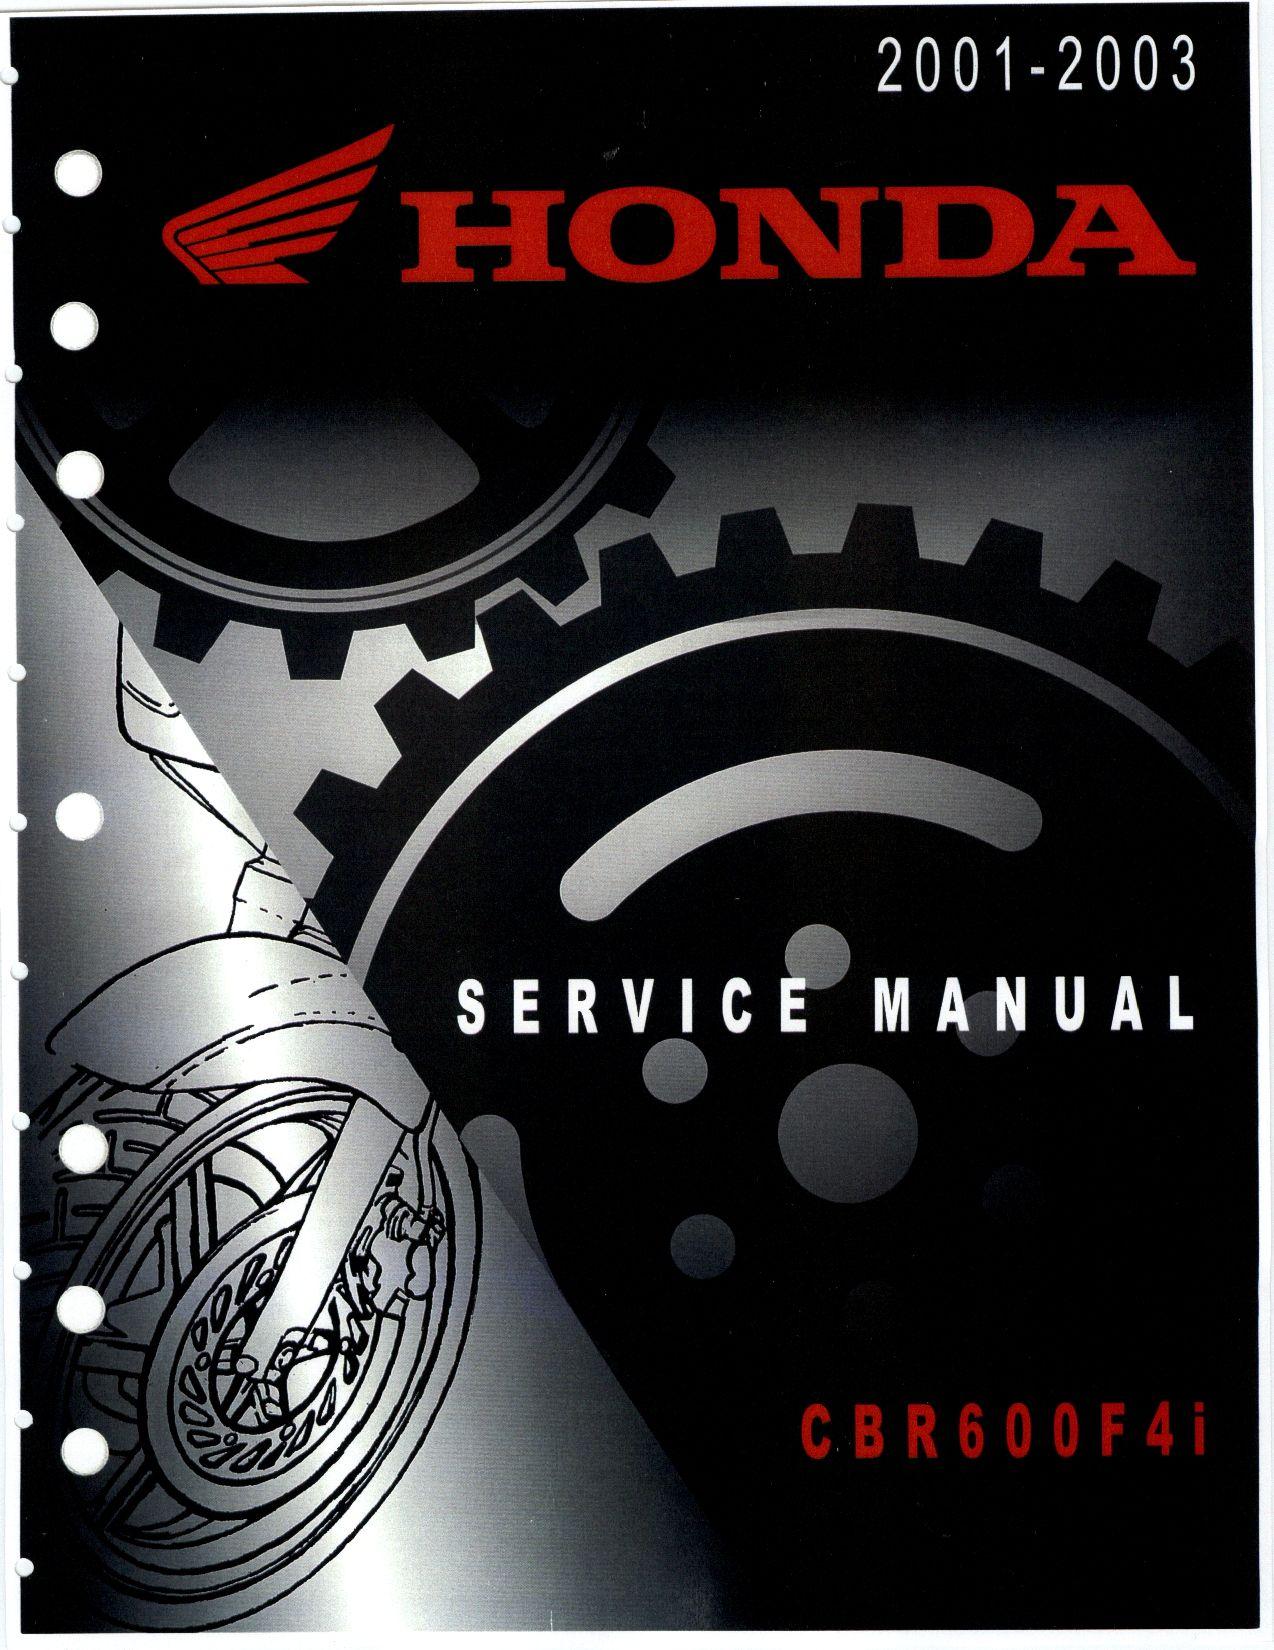 Honda Cbr 600 F4i 2001 2003 Repair Manual Pdf Download Service Manual Repair Manual Pdf Download Repair Manuals Honda Cbr 600 Honda Cbr